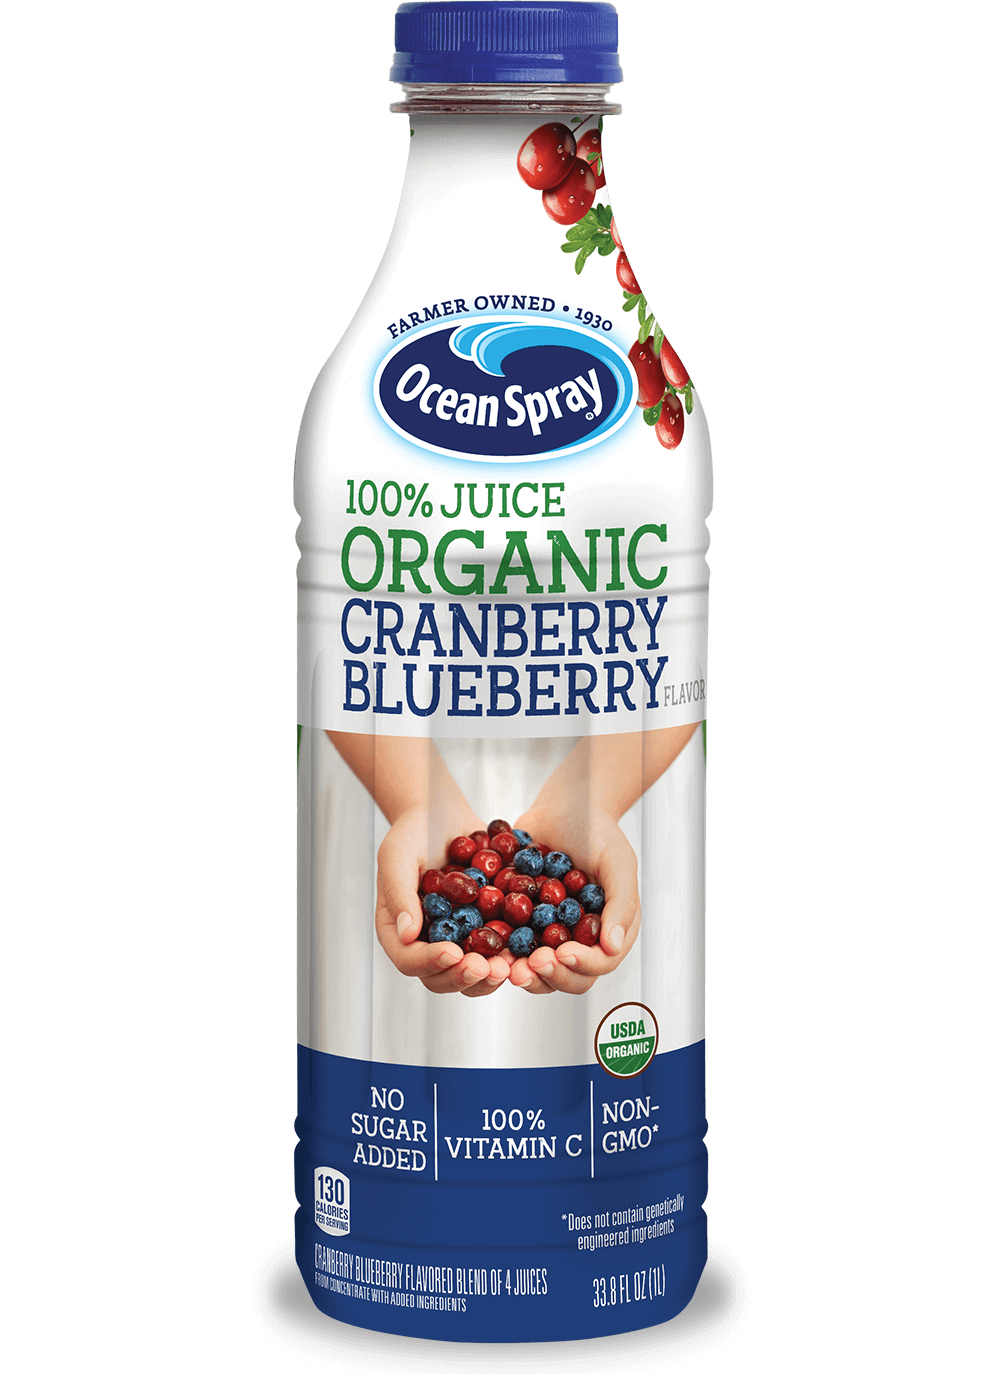 100% Juice Organic Cranberry Blueberry